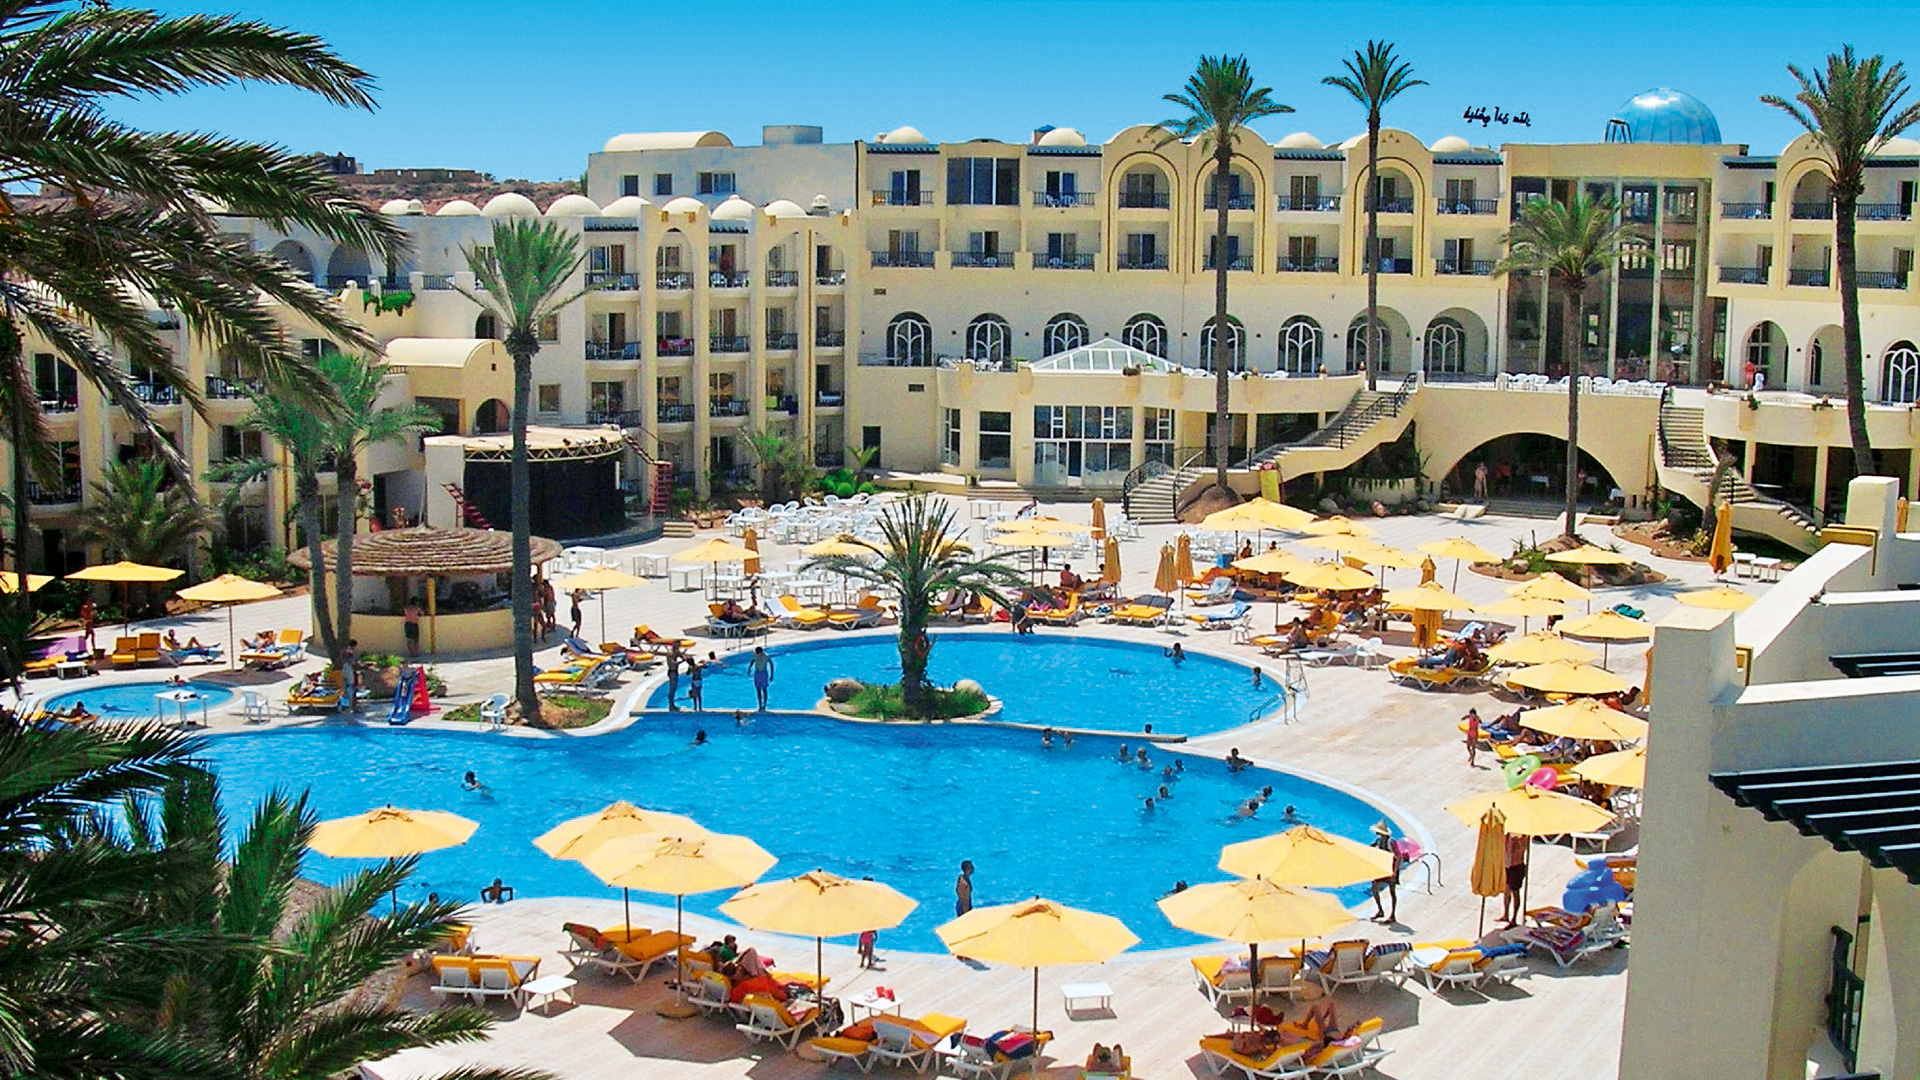 Hotel Eden Star, Djerba, Tunezja